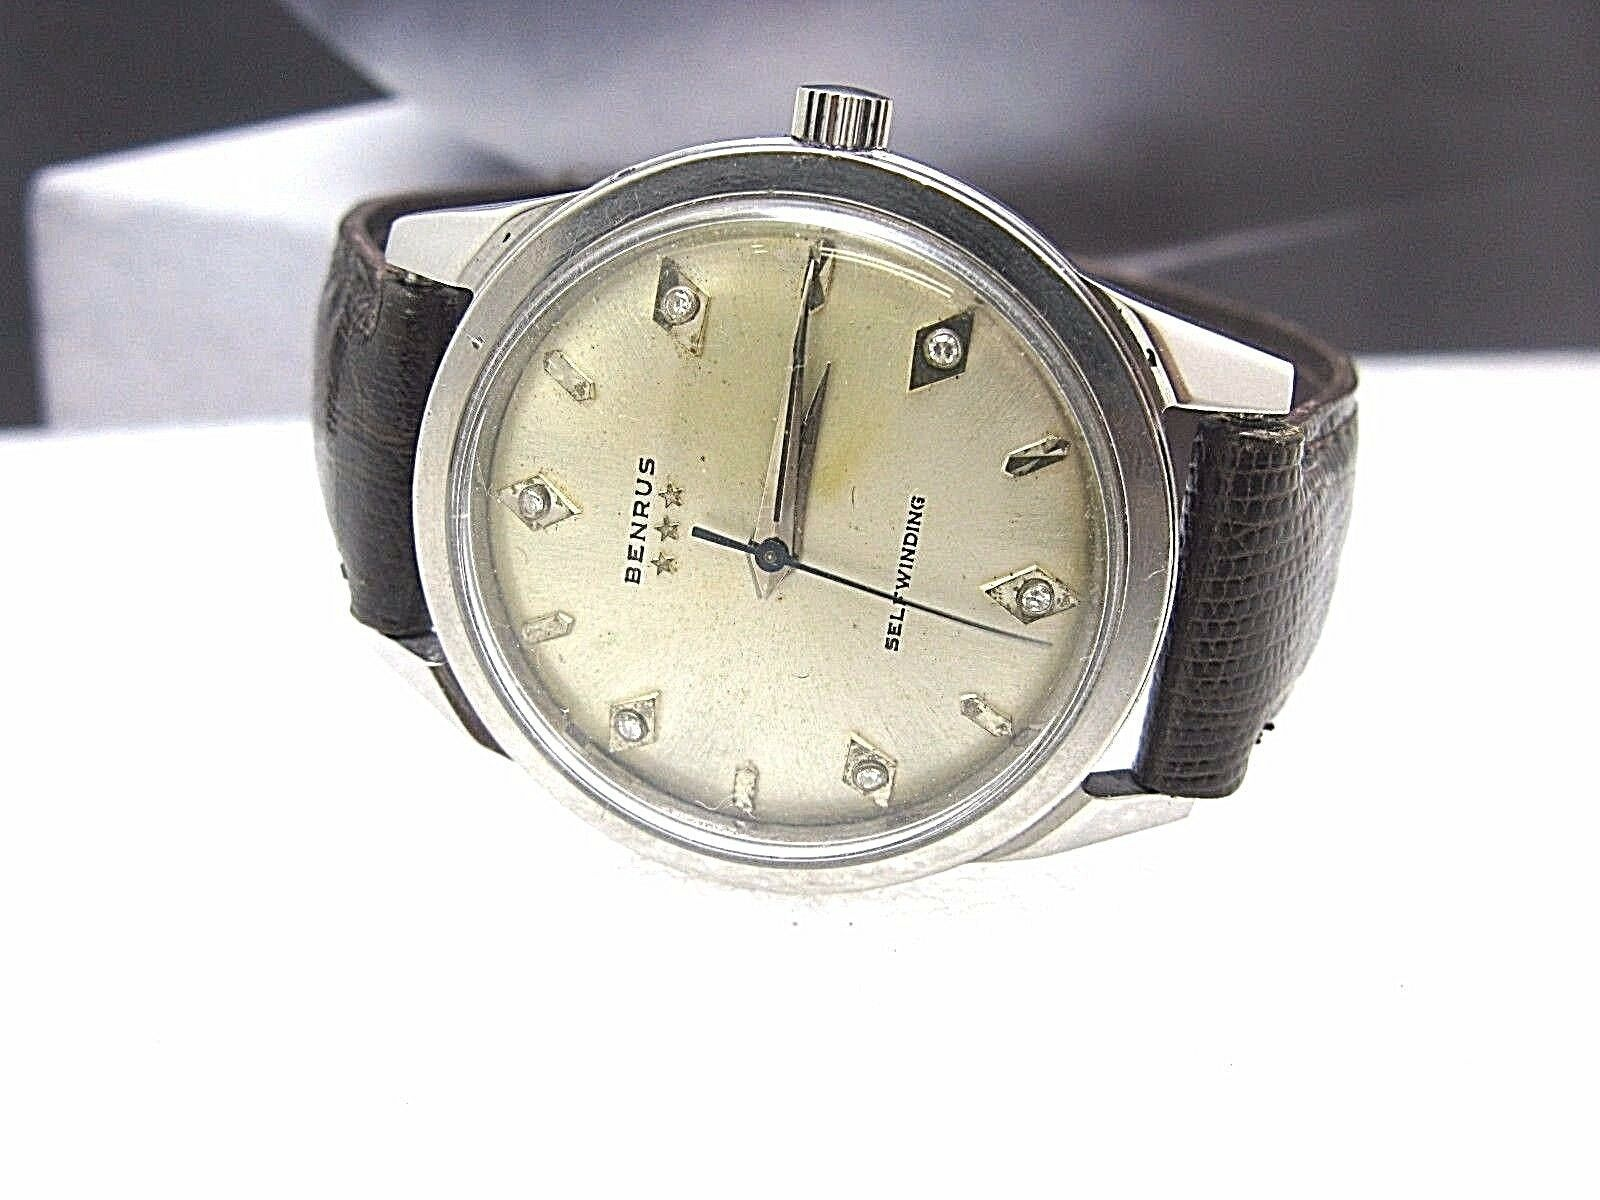 BENRUS Vintage tri Star self winding watch Switzerland Diamond Complete serviced